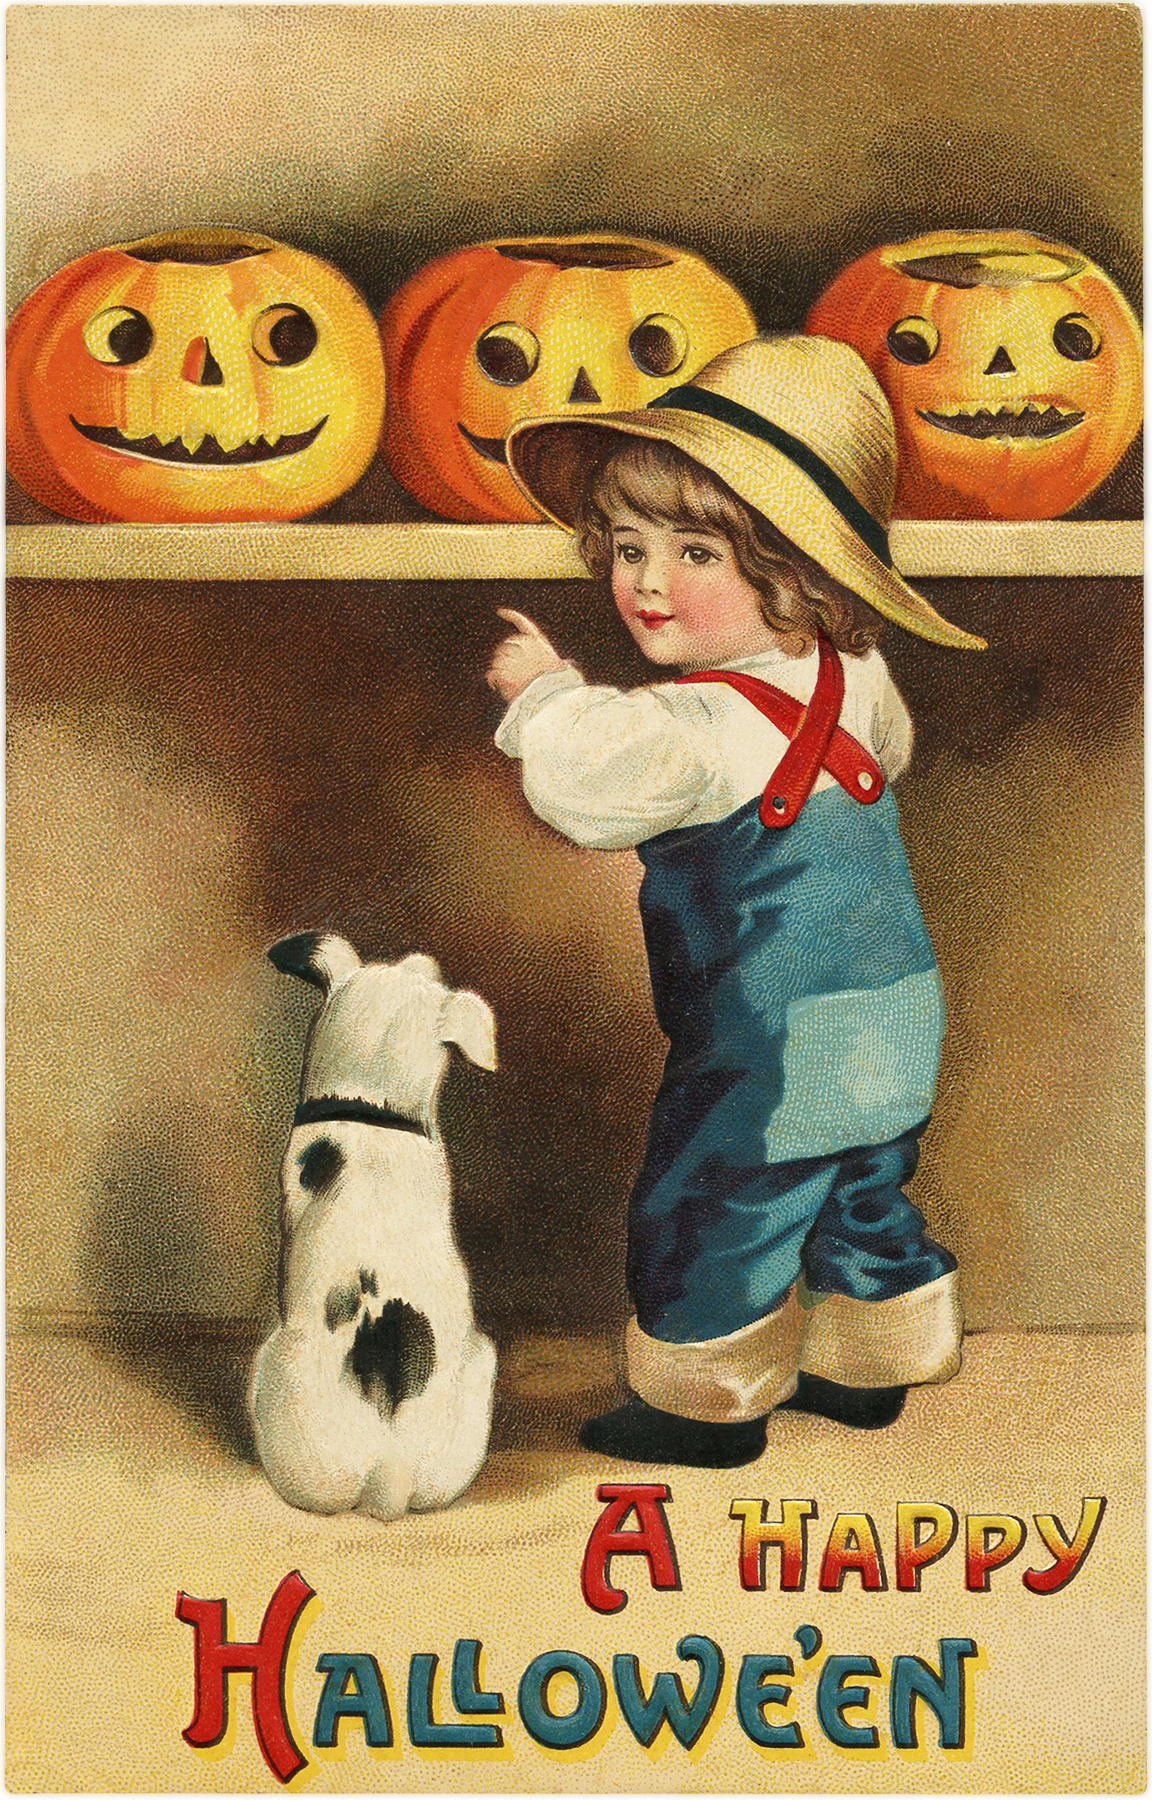 Darling Vintage Halloween Boy Image